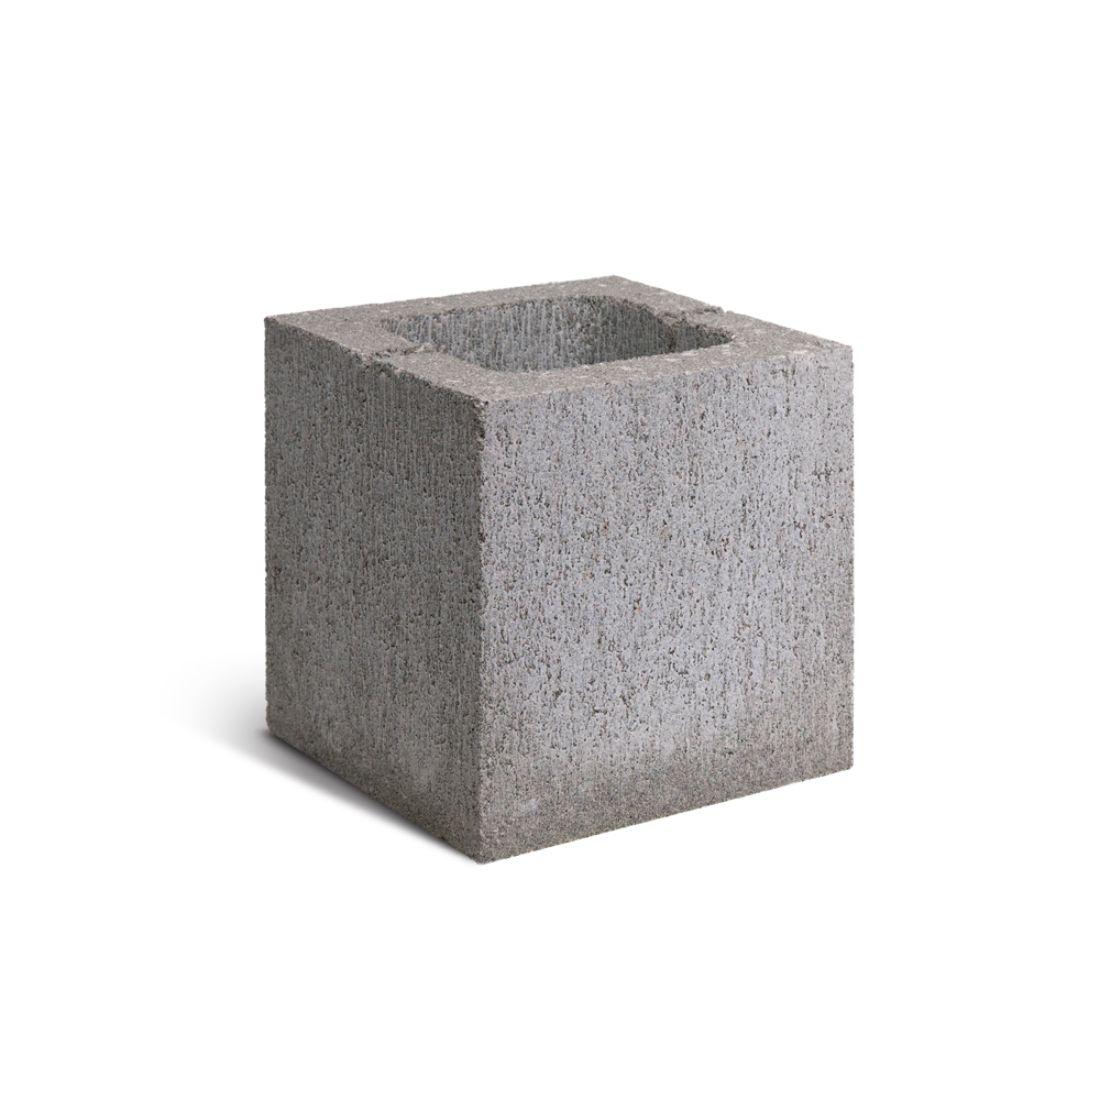 20.02 Half Block 190 x 190 x 190mm